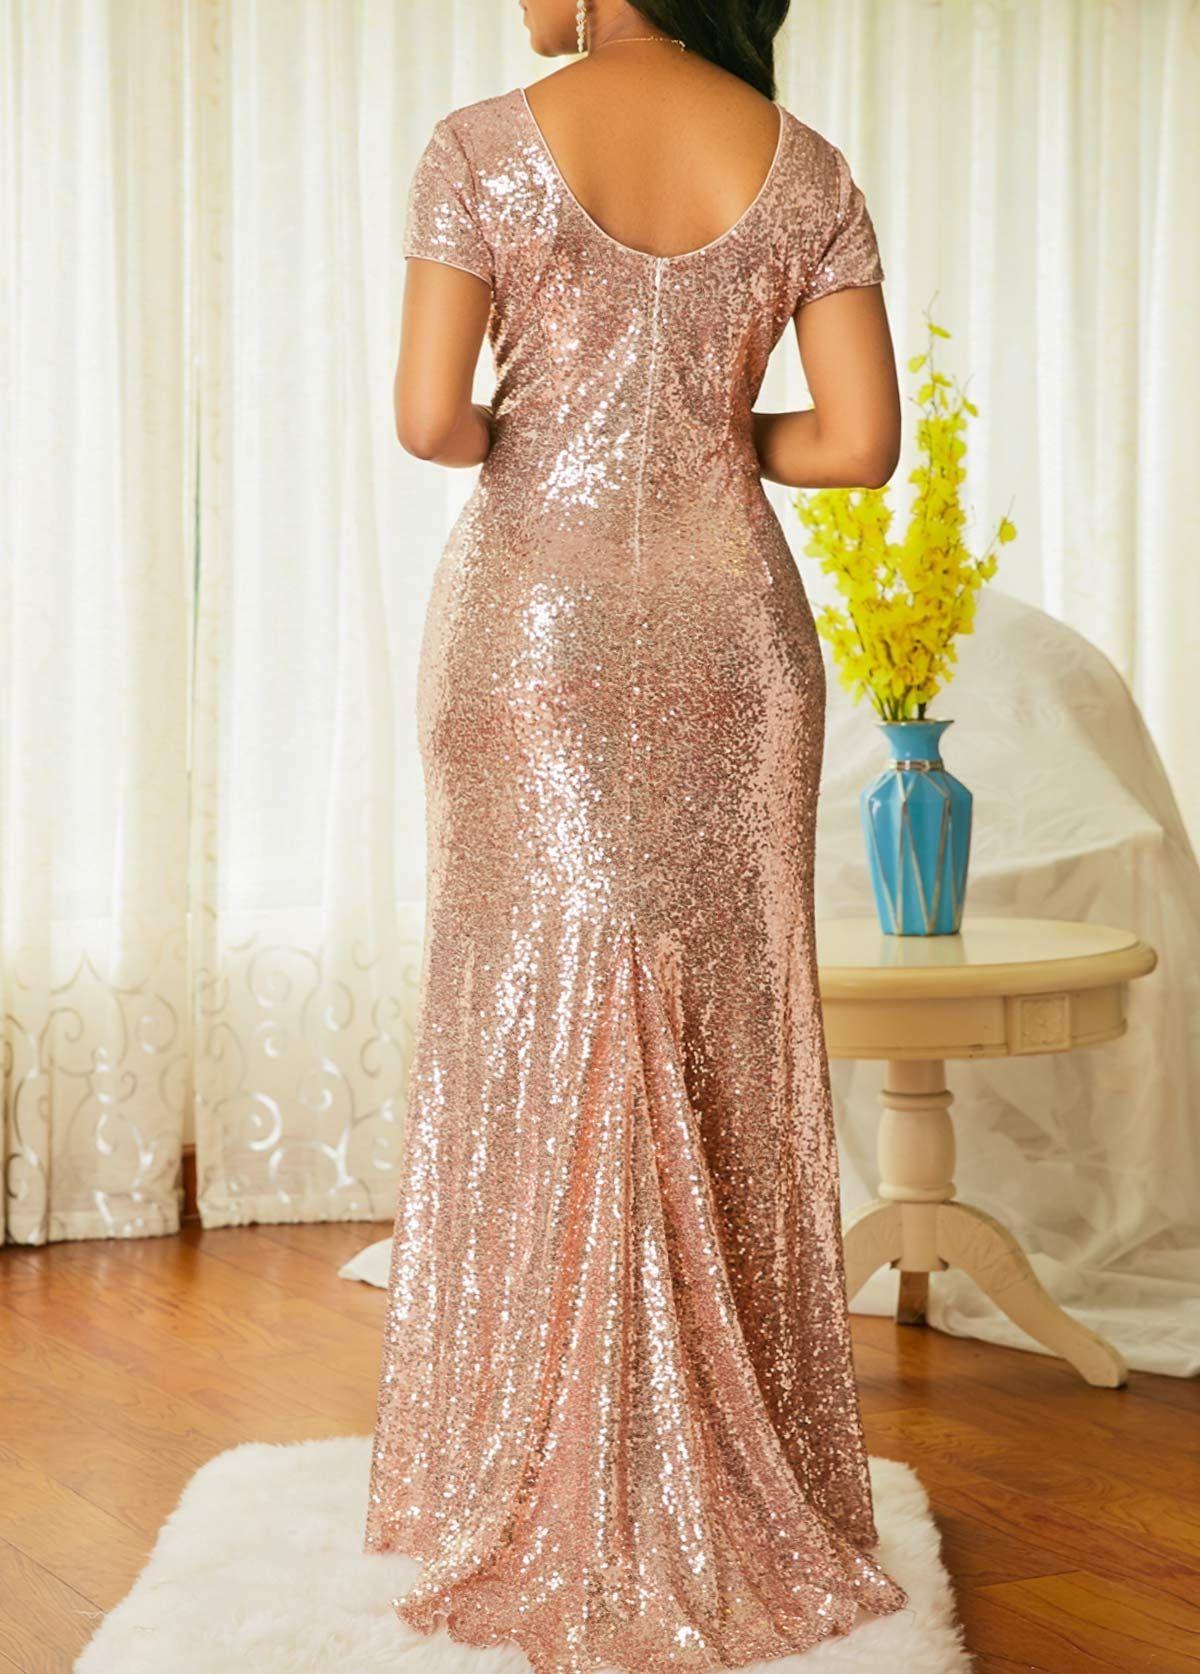 Black lace dress 3/4 sleeve may 2019 Beautiful Dresses dress dresses rosewe  Nice in   Pinterest